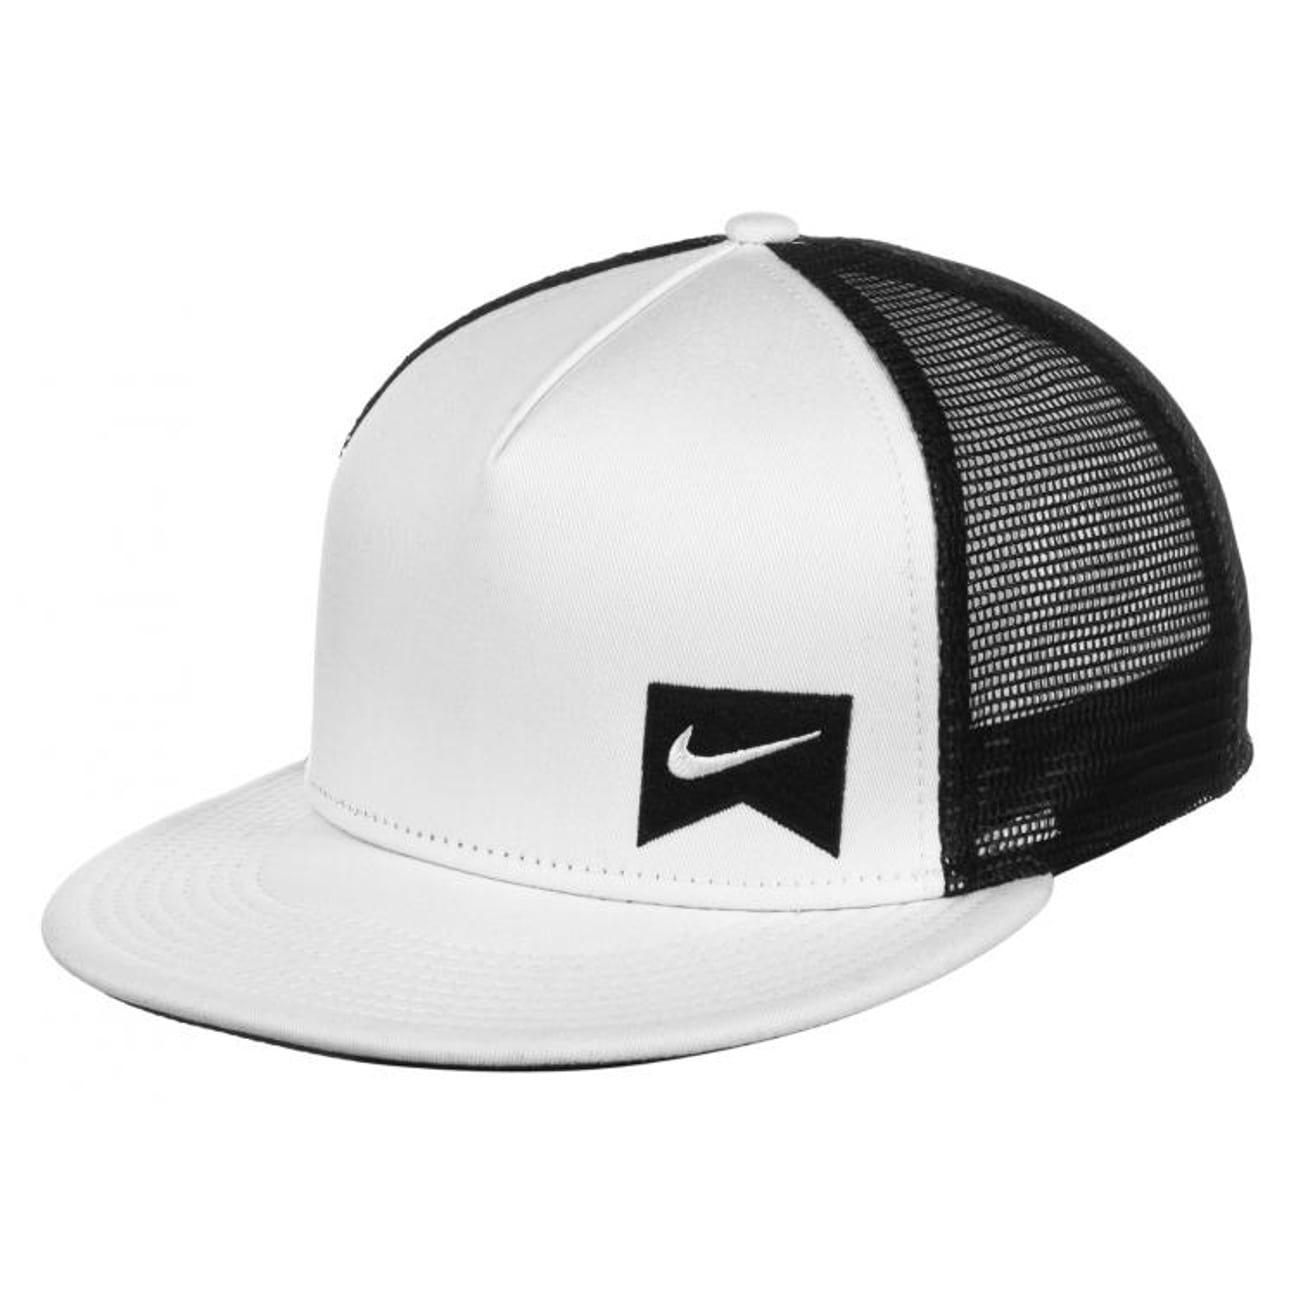 b2e2ec163cf ... black 1 · Icon Trucker Snapback Cap by NIKE - white 1 ...